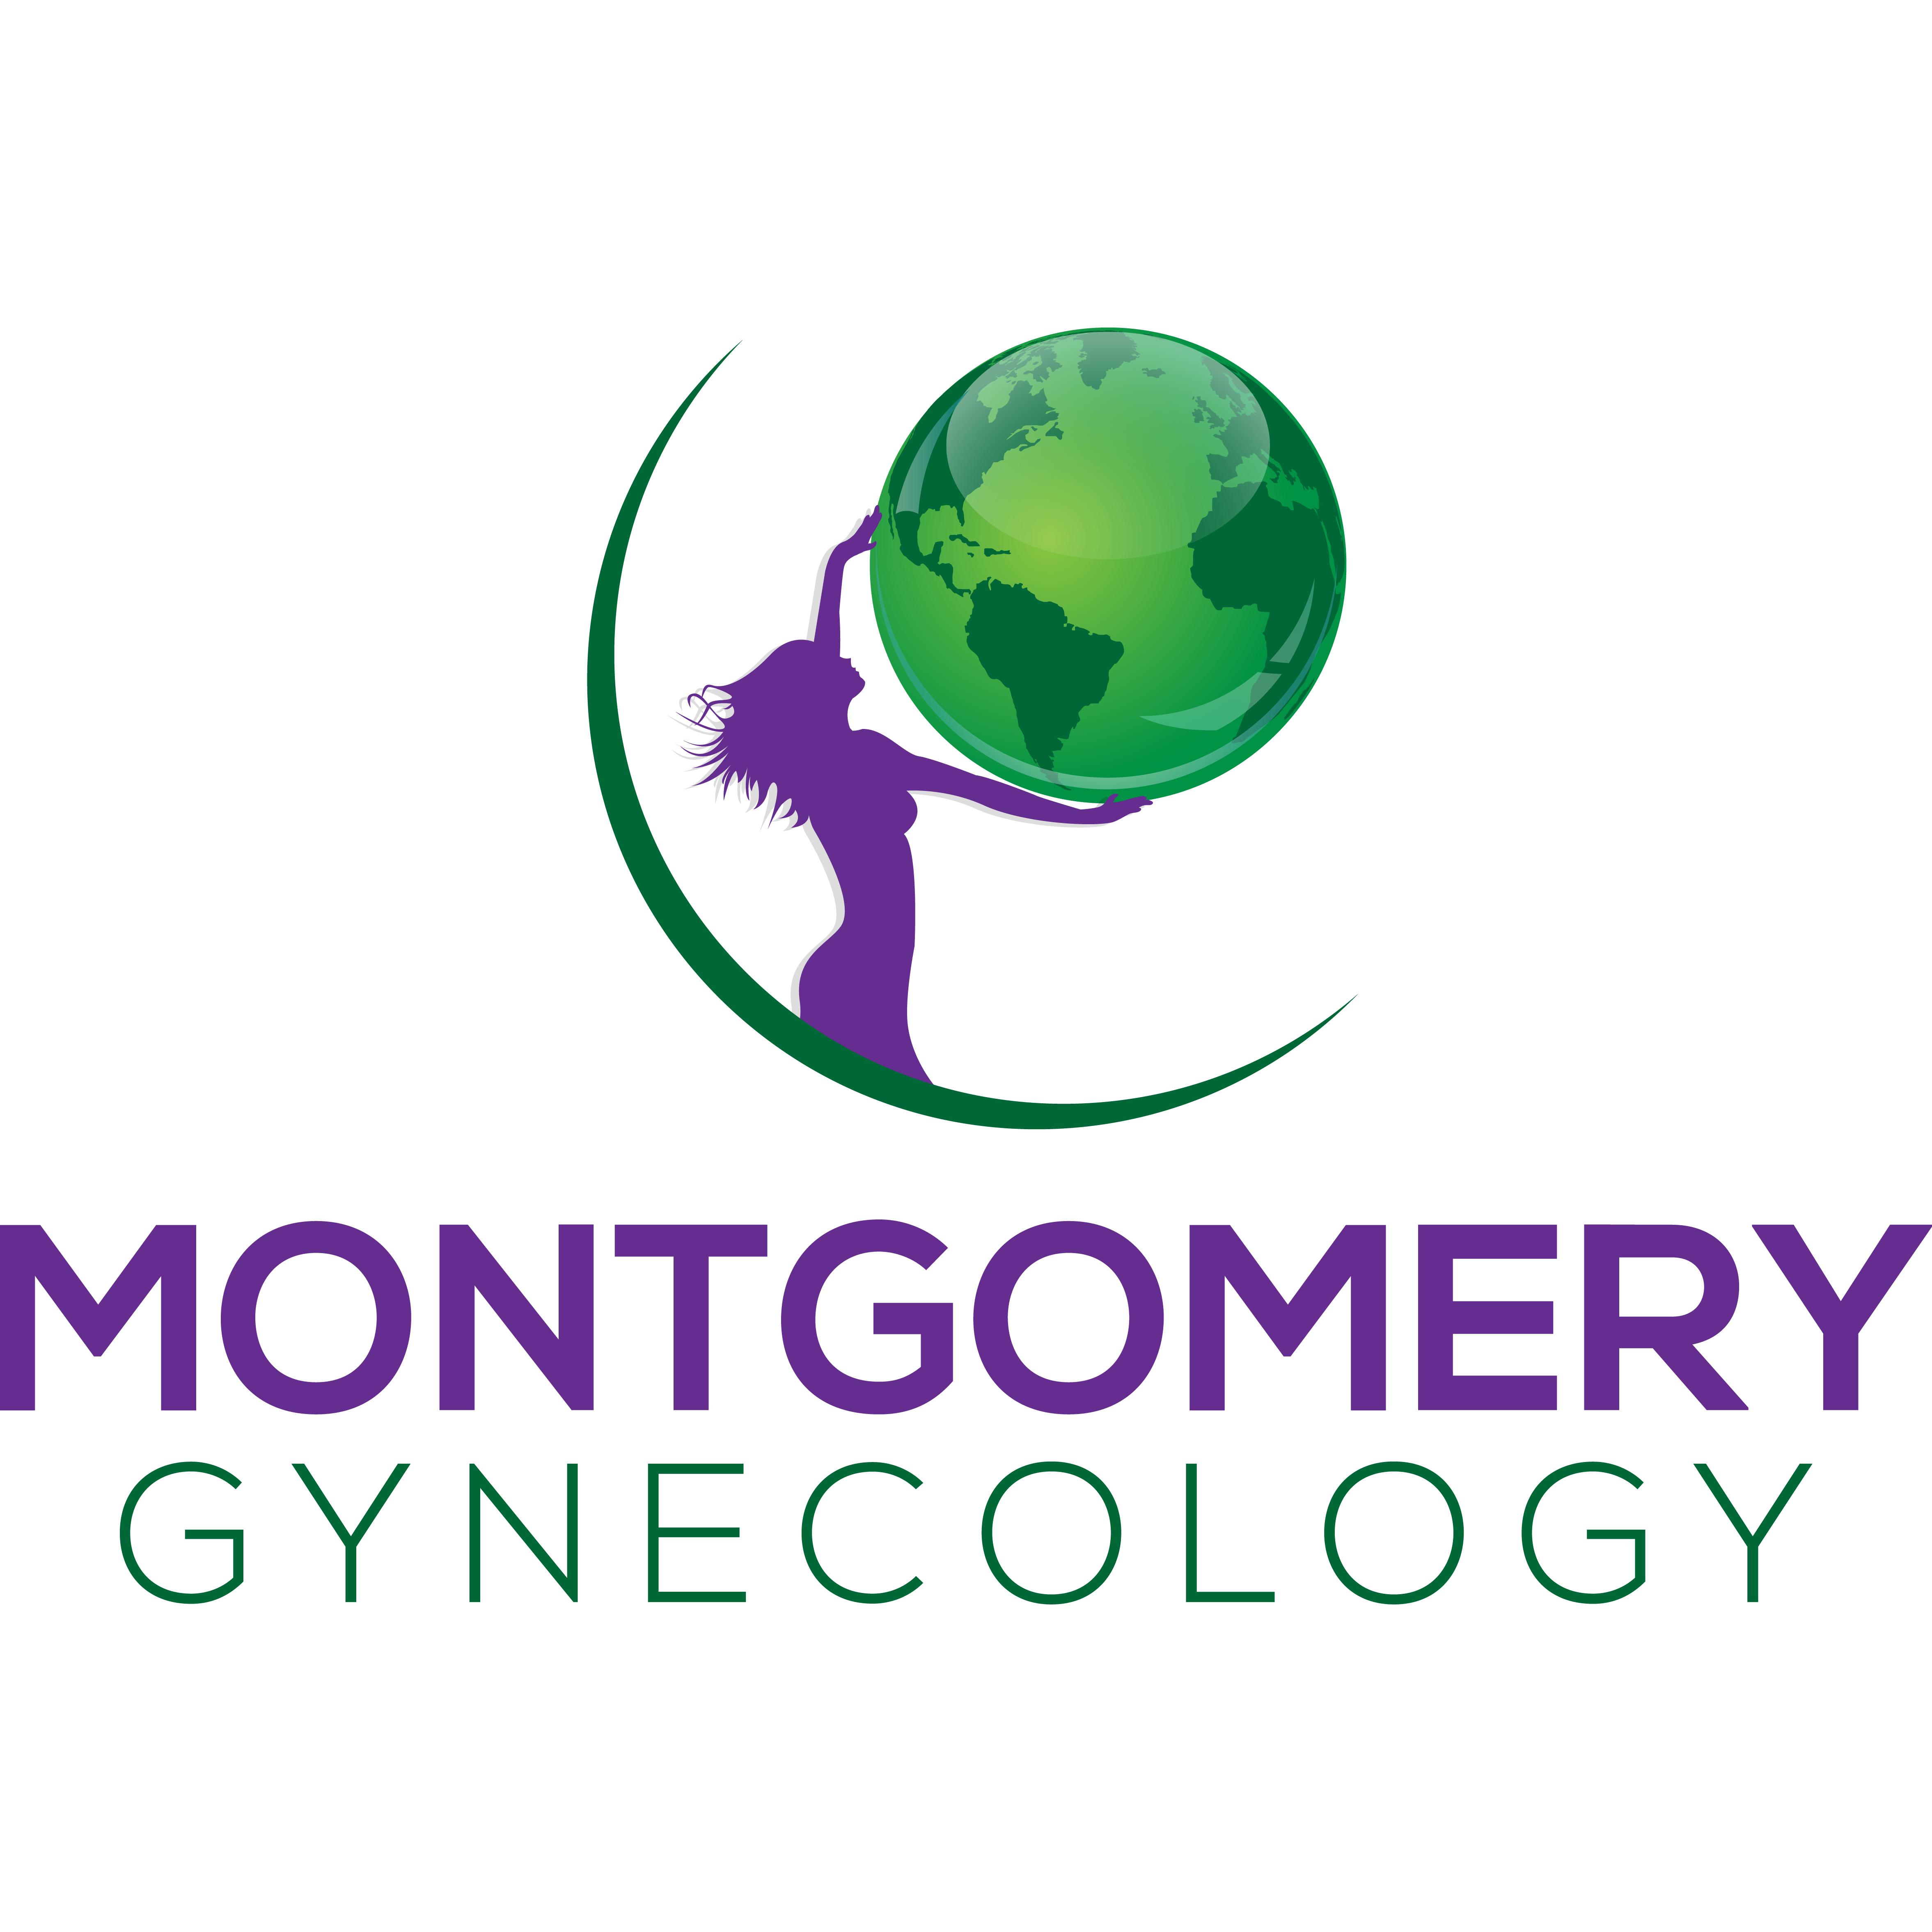 Montgomery Gynecology